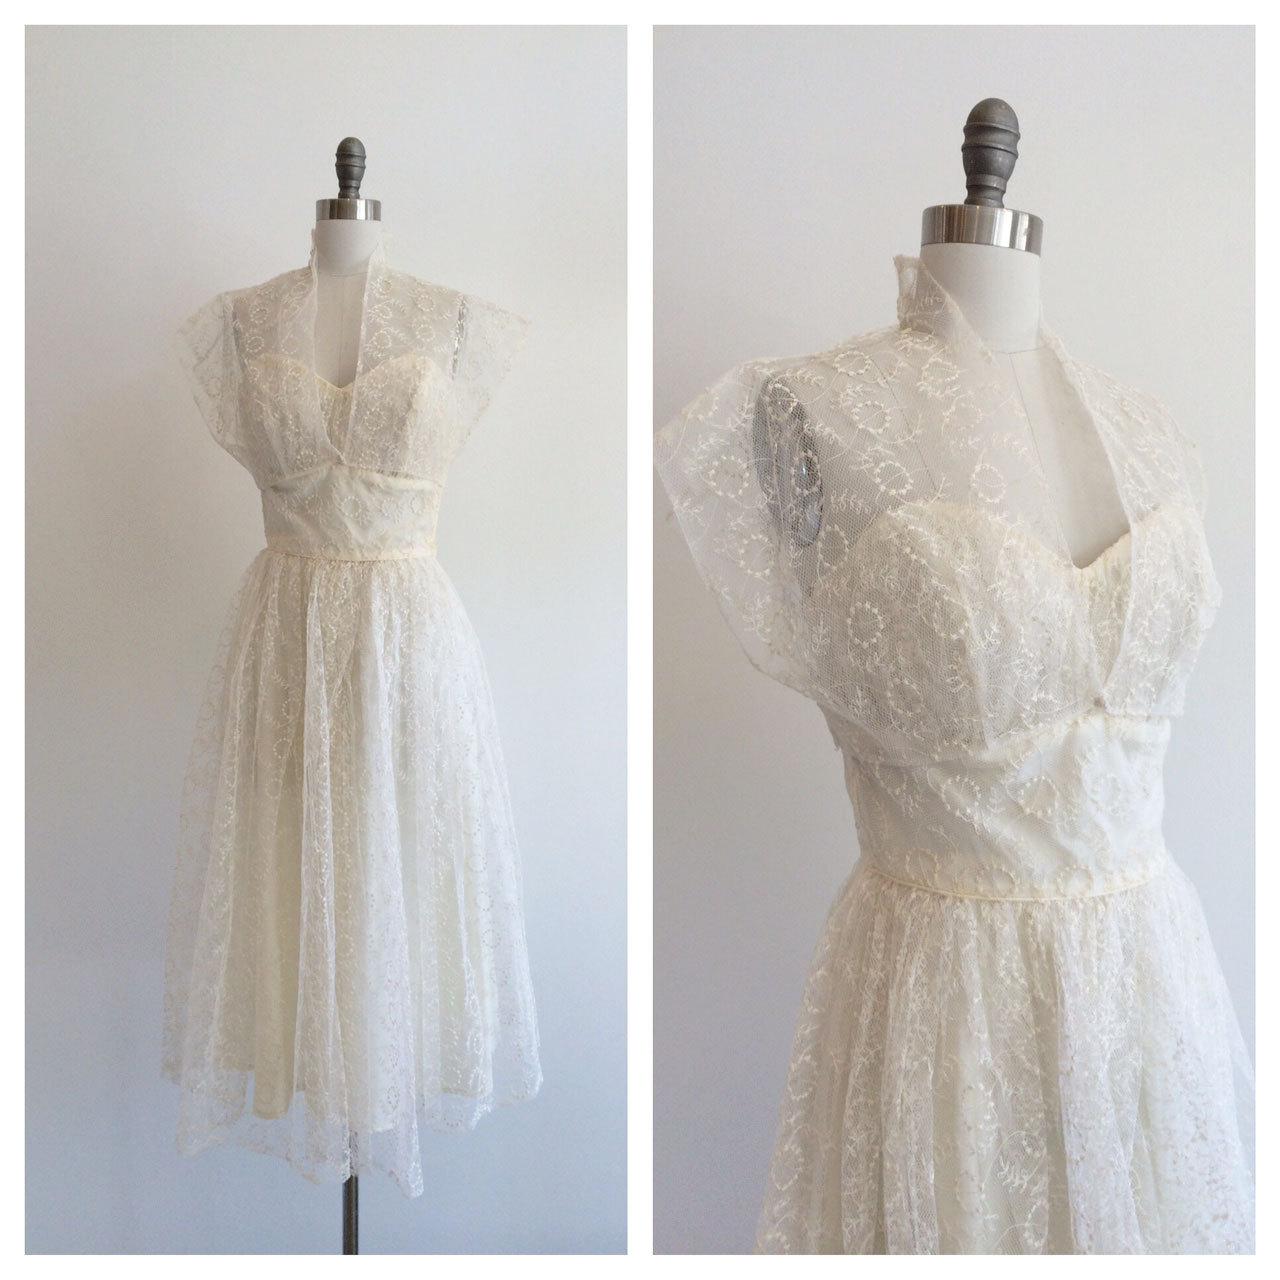 1940s \u2013 1950s Vintage Elegant Wedding Dress Crystal Bridal Clip /& Screw-back Earrings \u2013 Bridal Accessories you choose Wedding Jewelry